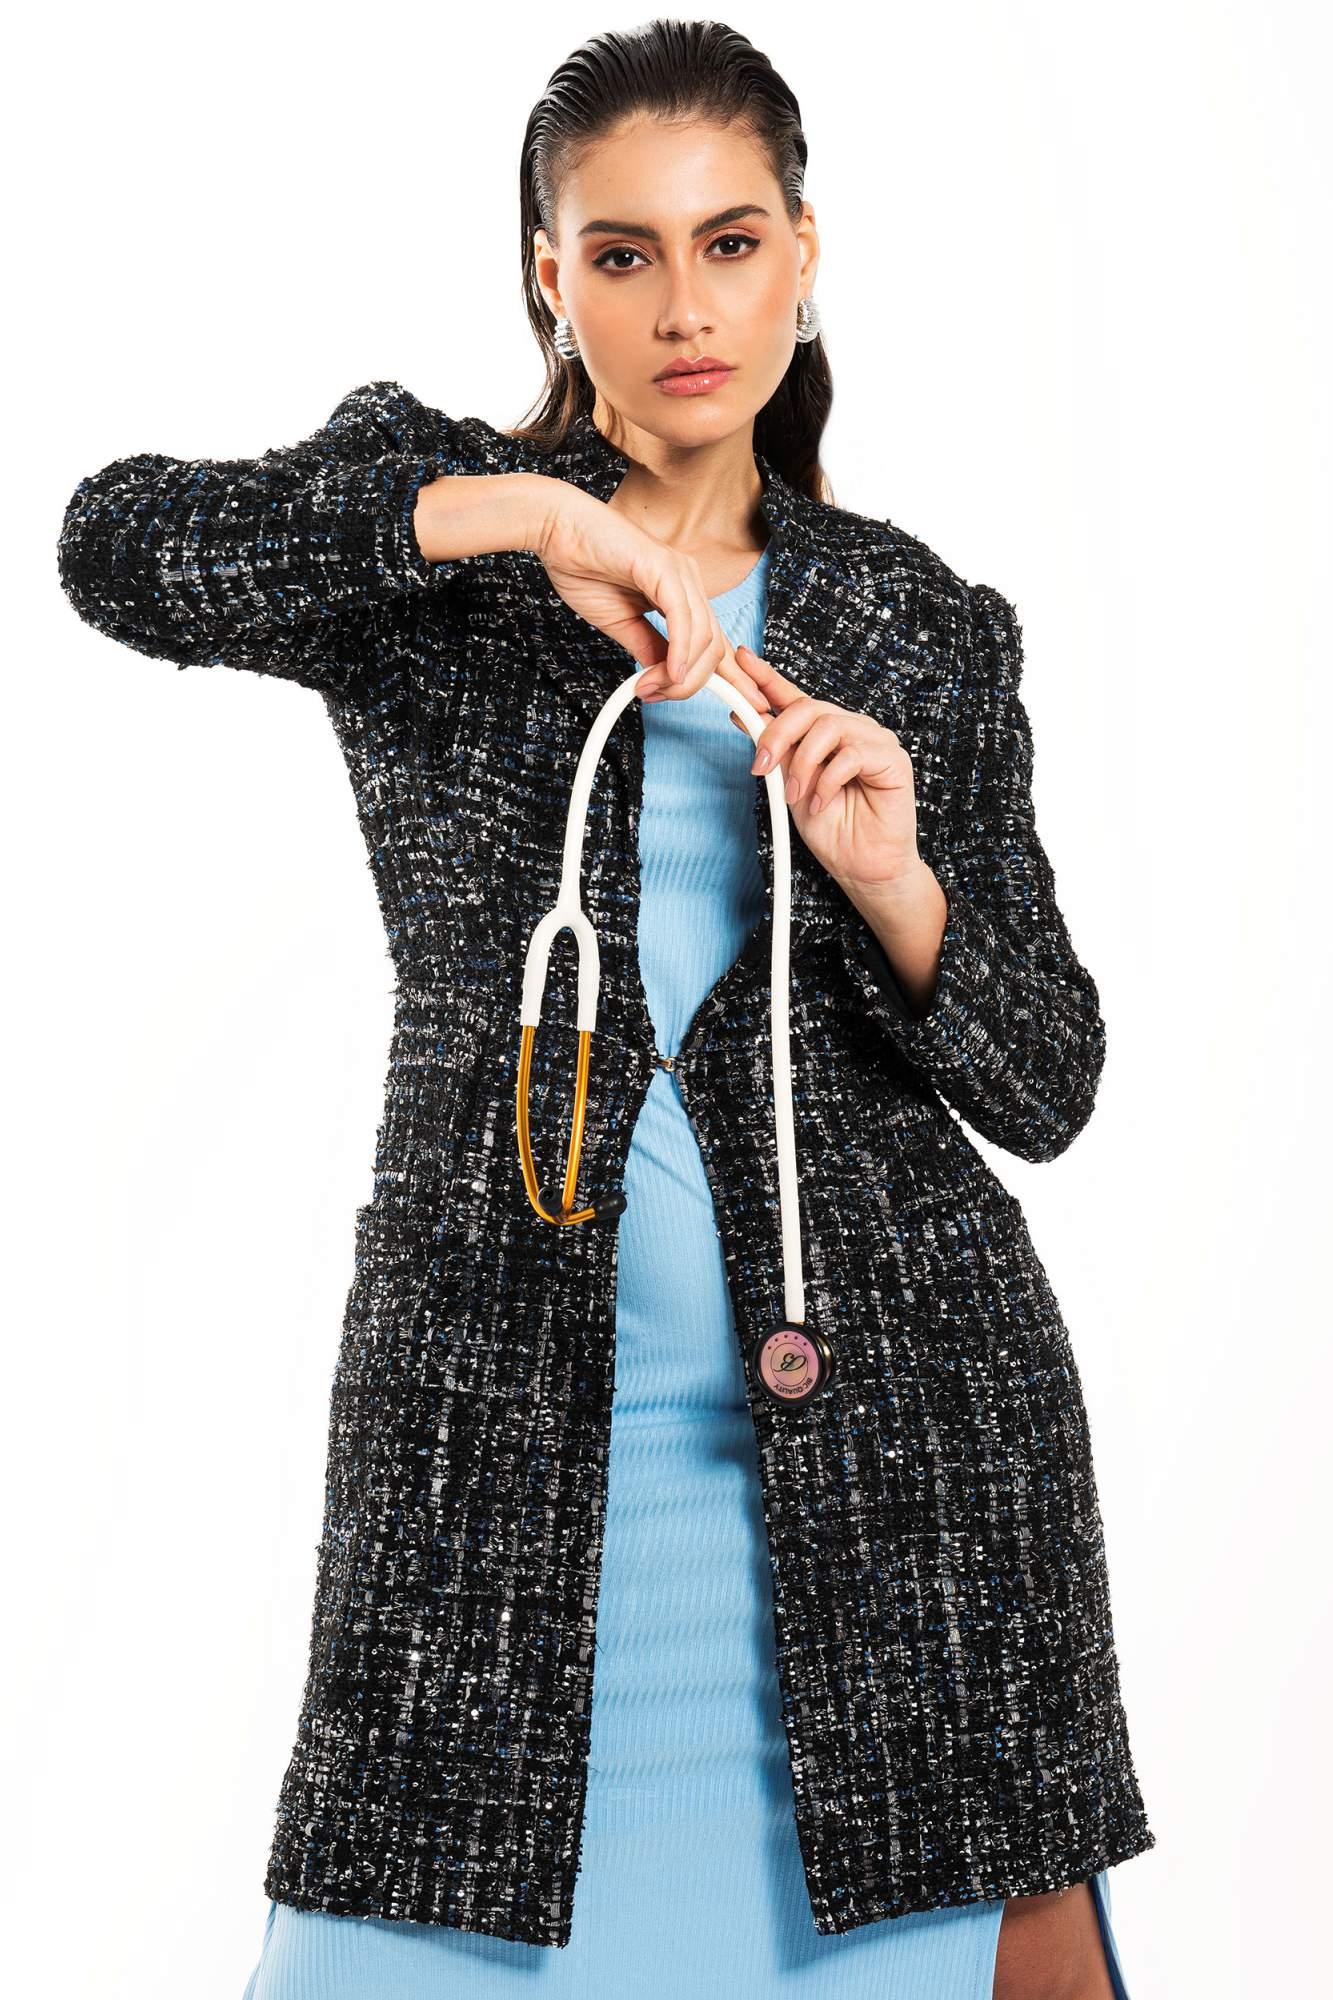 Jaleco Feminino de Inverno Trench Coat Alba Black